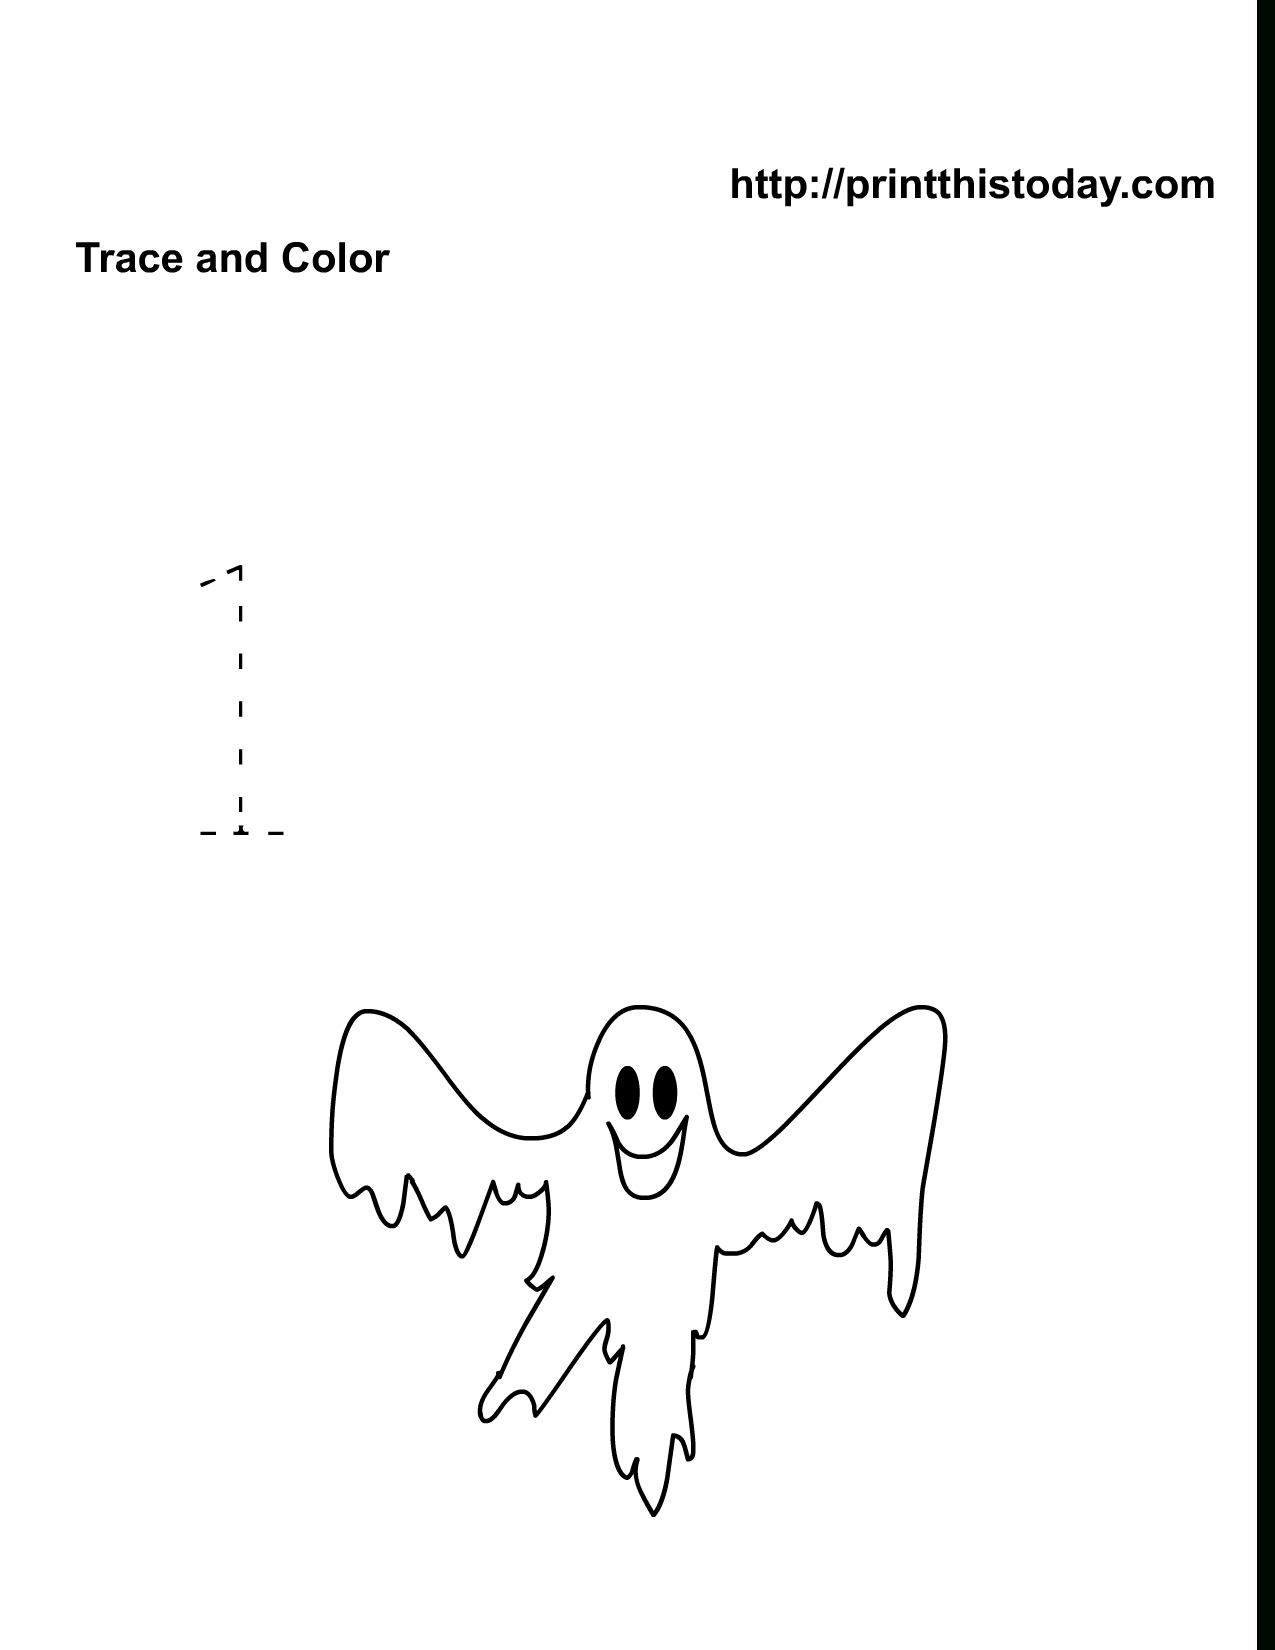 Free Printable Halloween Math Worksheets For Pre-School And Kindergarten | Printable Halloween Math Worksheets